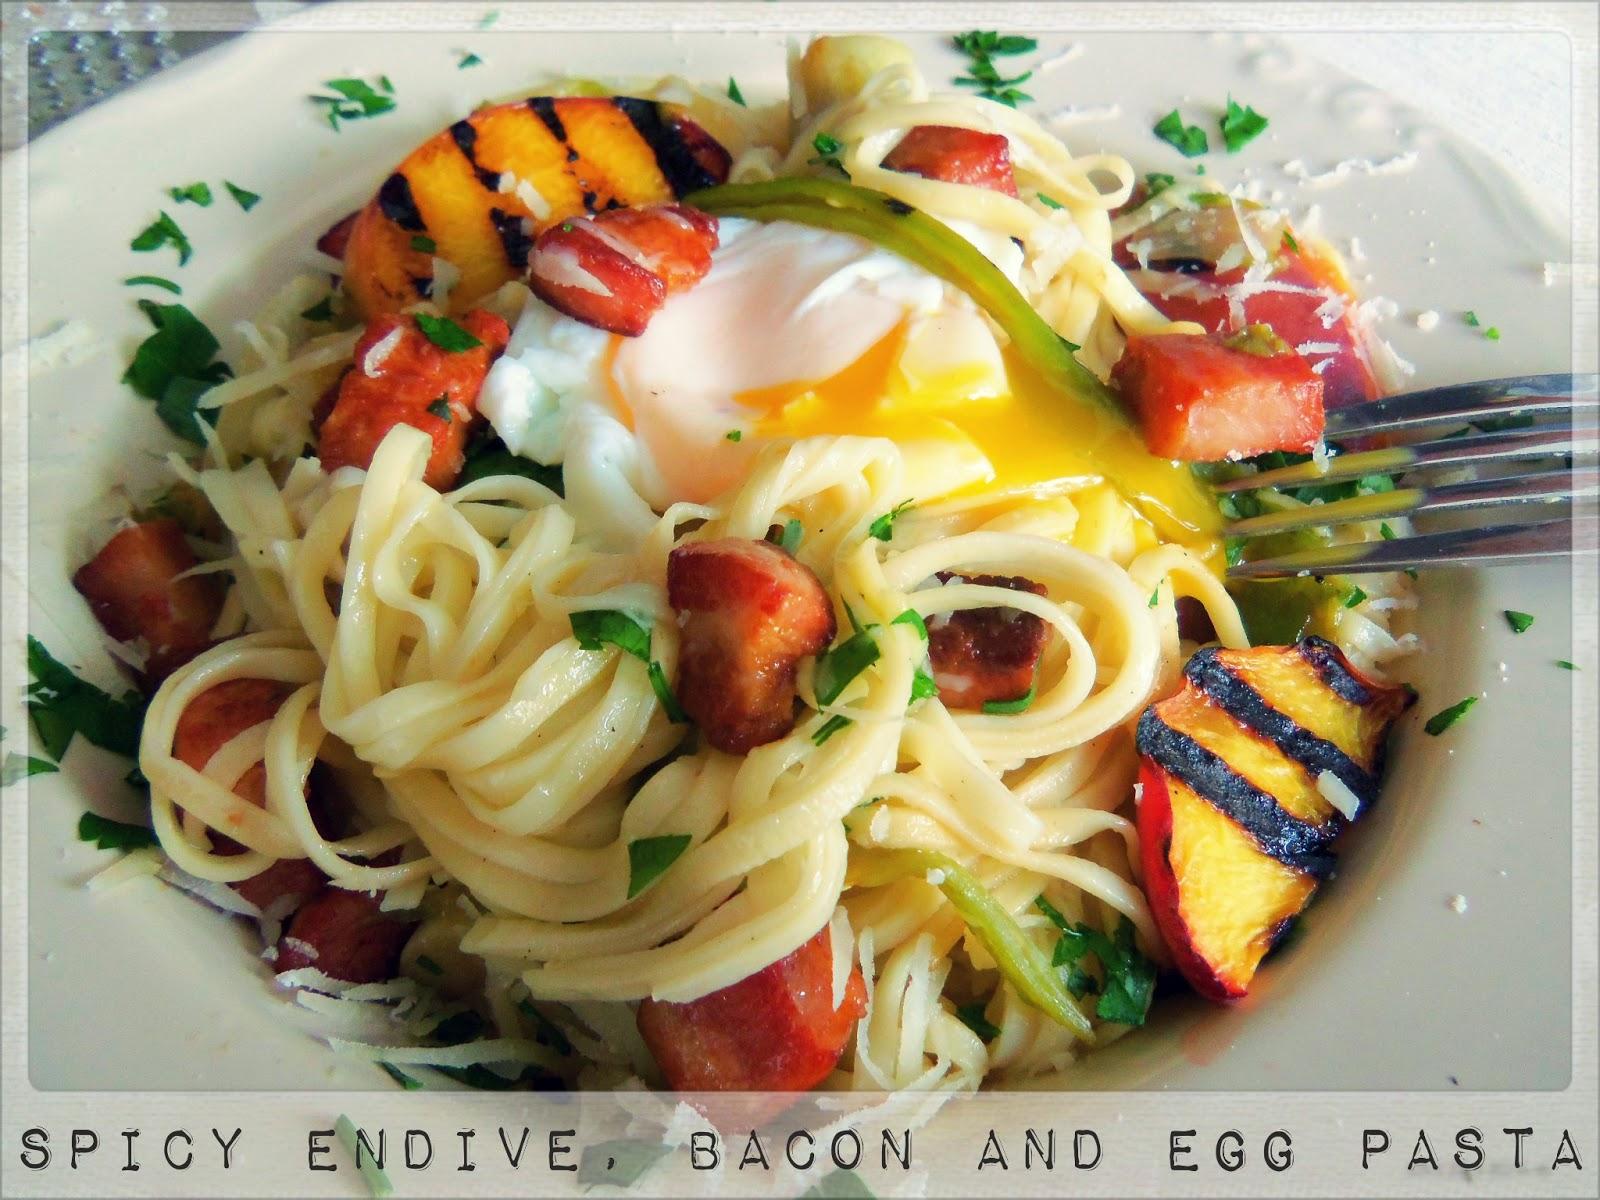 Bacon and egg pasta recipes